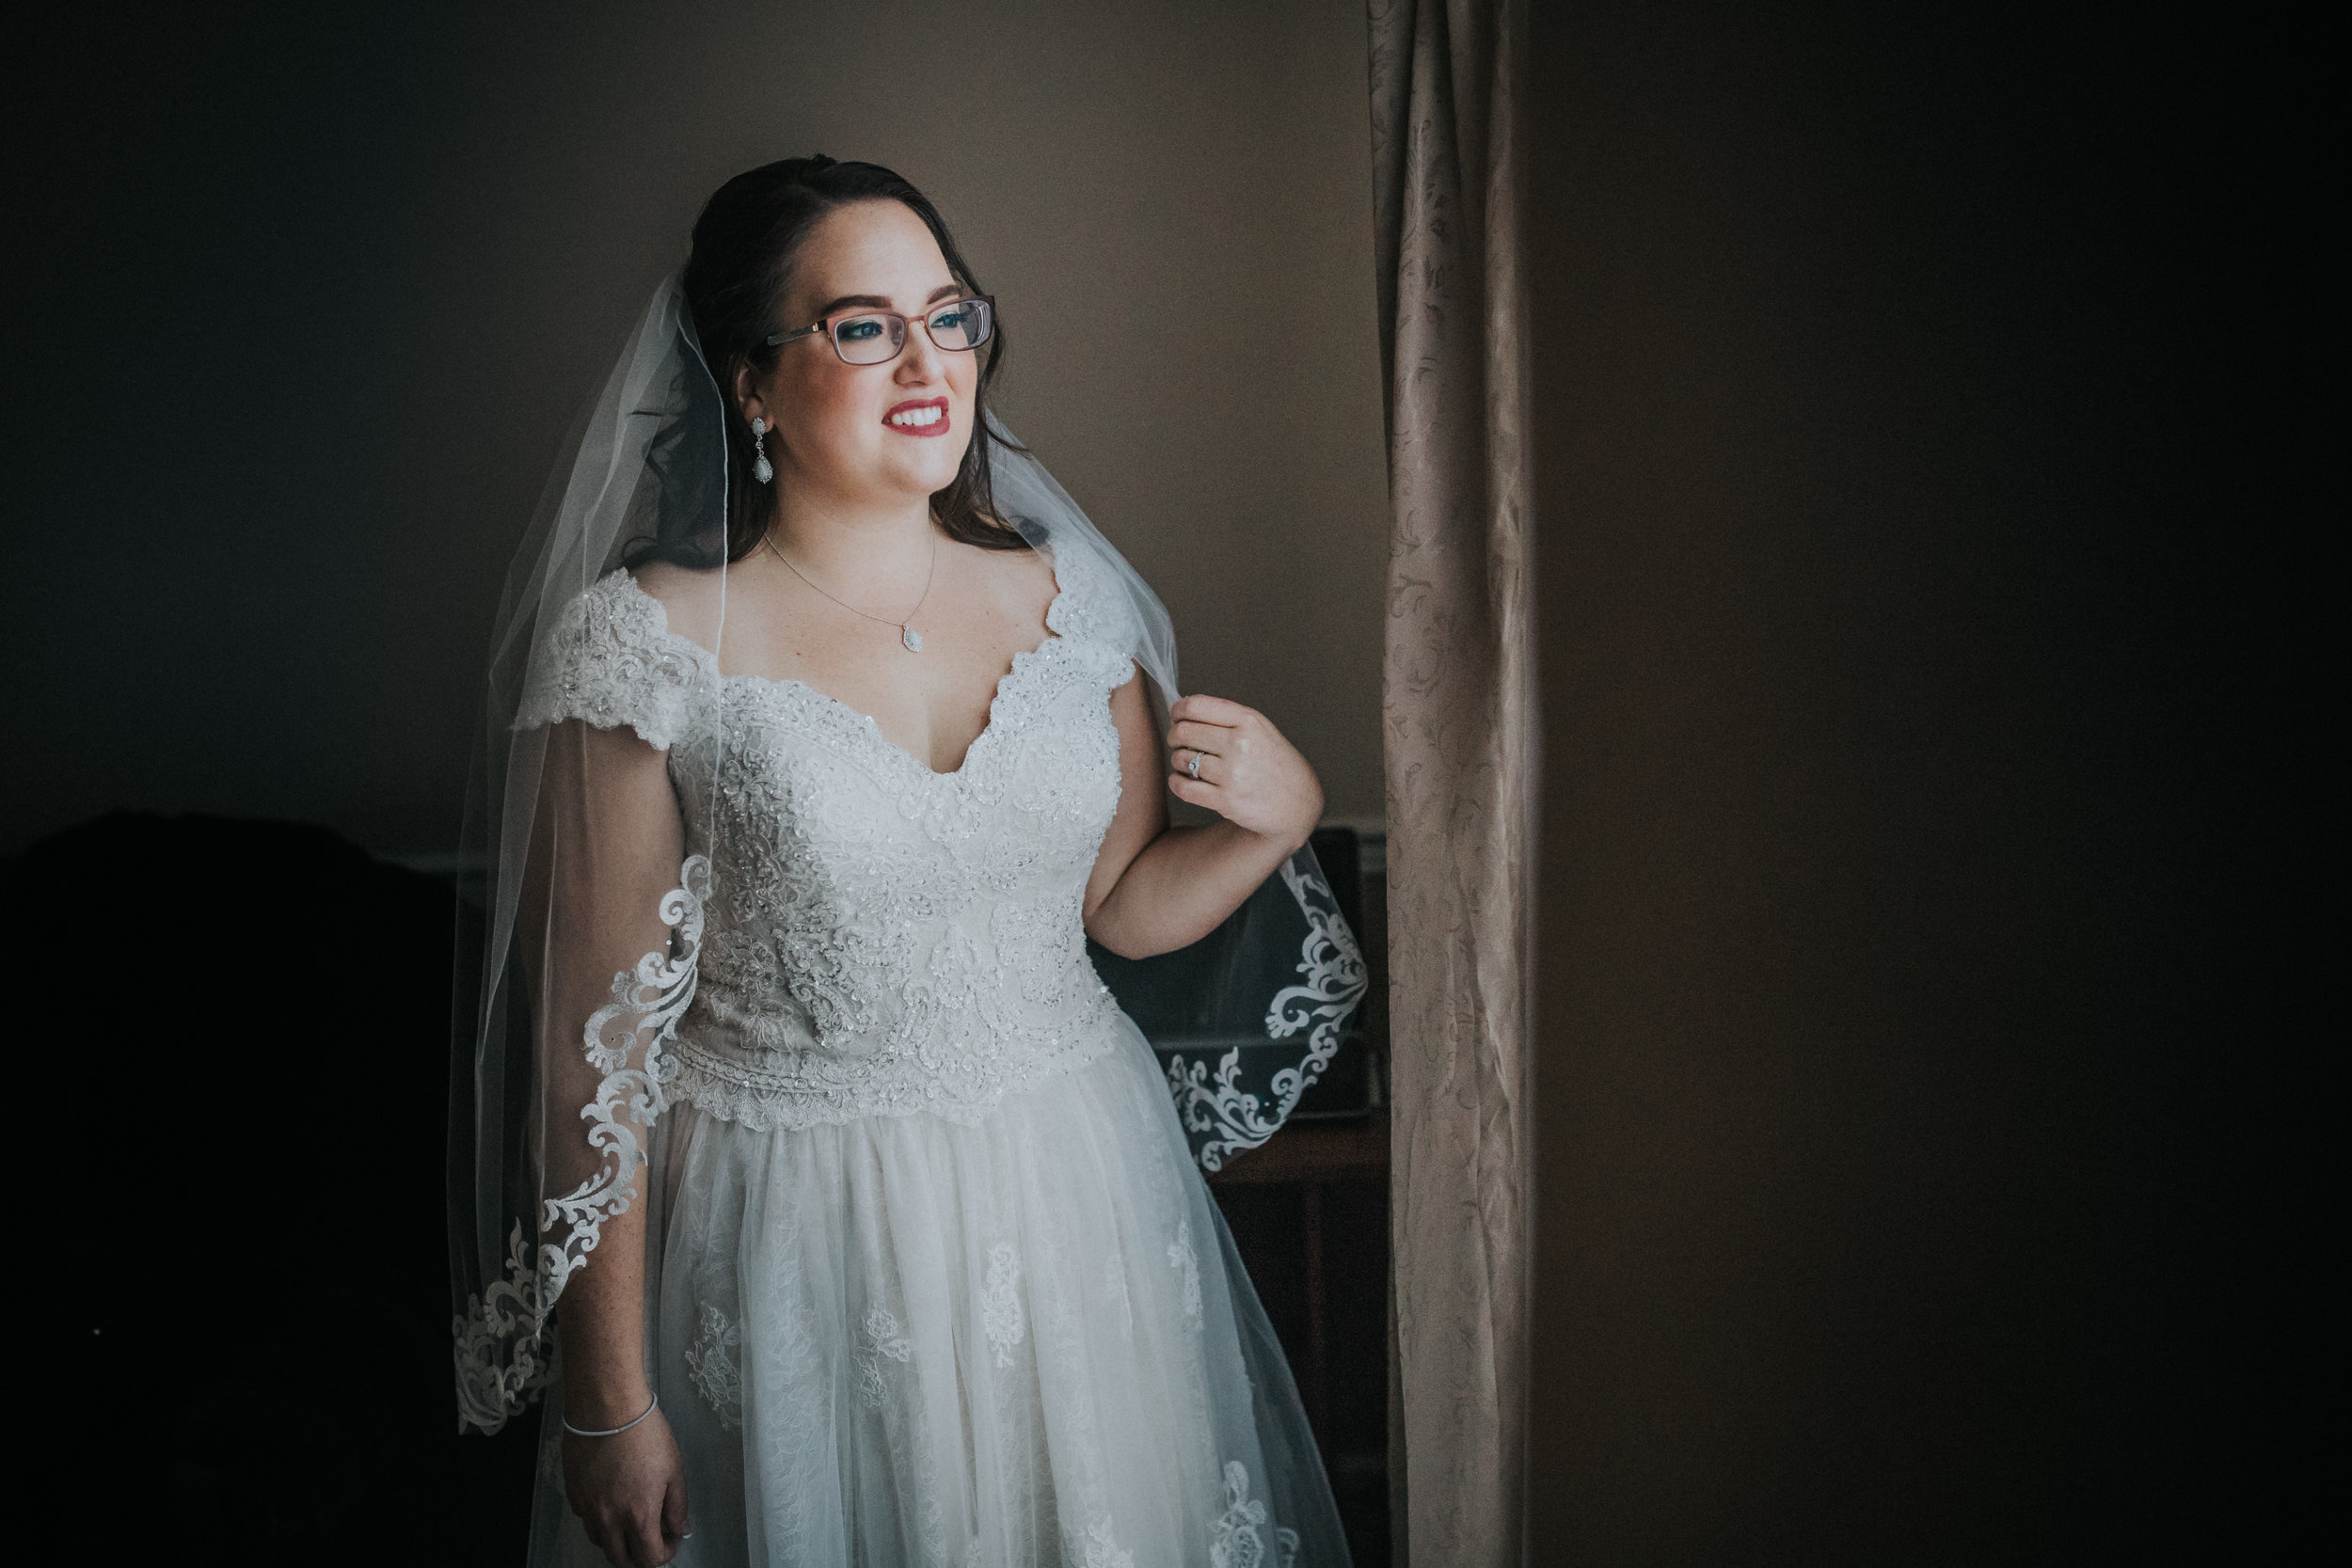 New-Jersey-Wedding-Photography-Fishers-Tudor-House-JennaLynnPhotography-Getting-Ready-Kathleen&Eddie-72.jpg